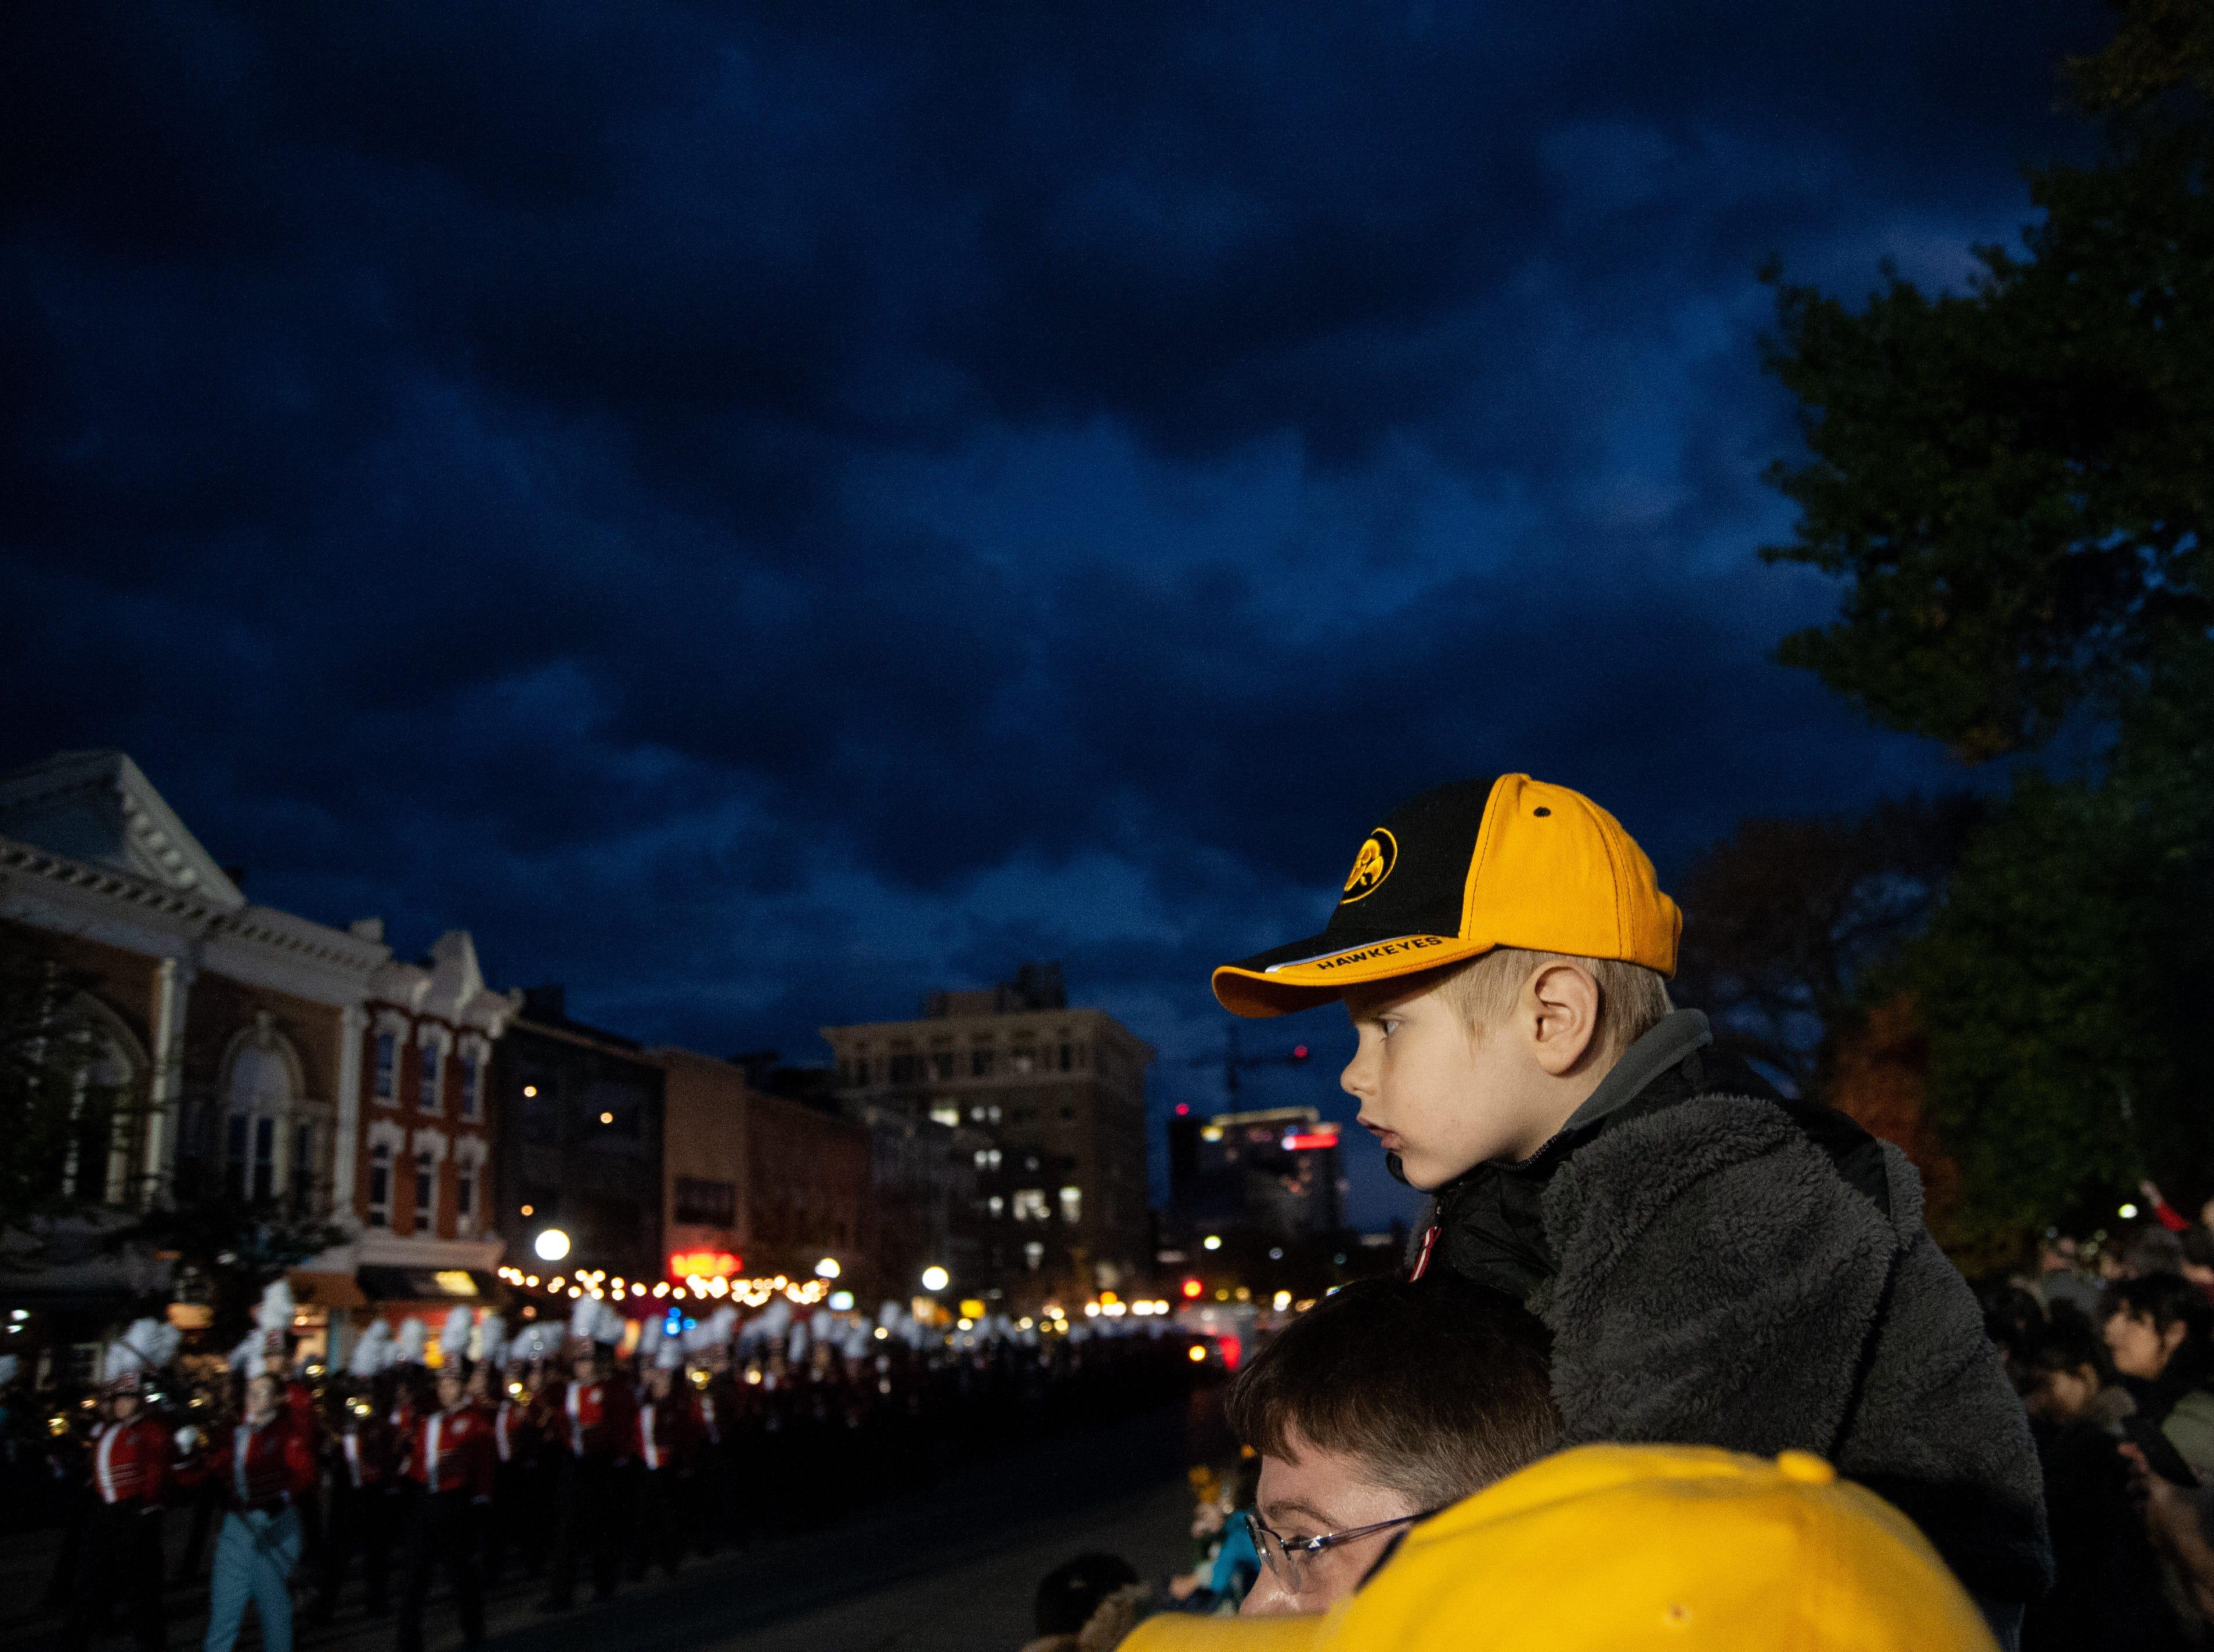 Luke Winborn, 4, rests on Brett Windorn, during the 2018 Homecoming parade, Friday, Oct. 19, 2018, in Iowa City.